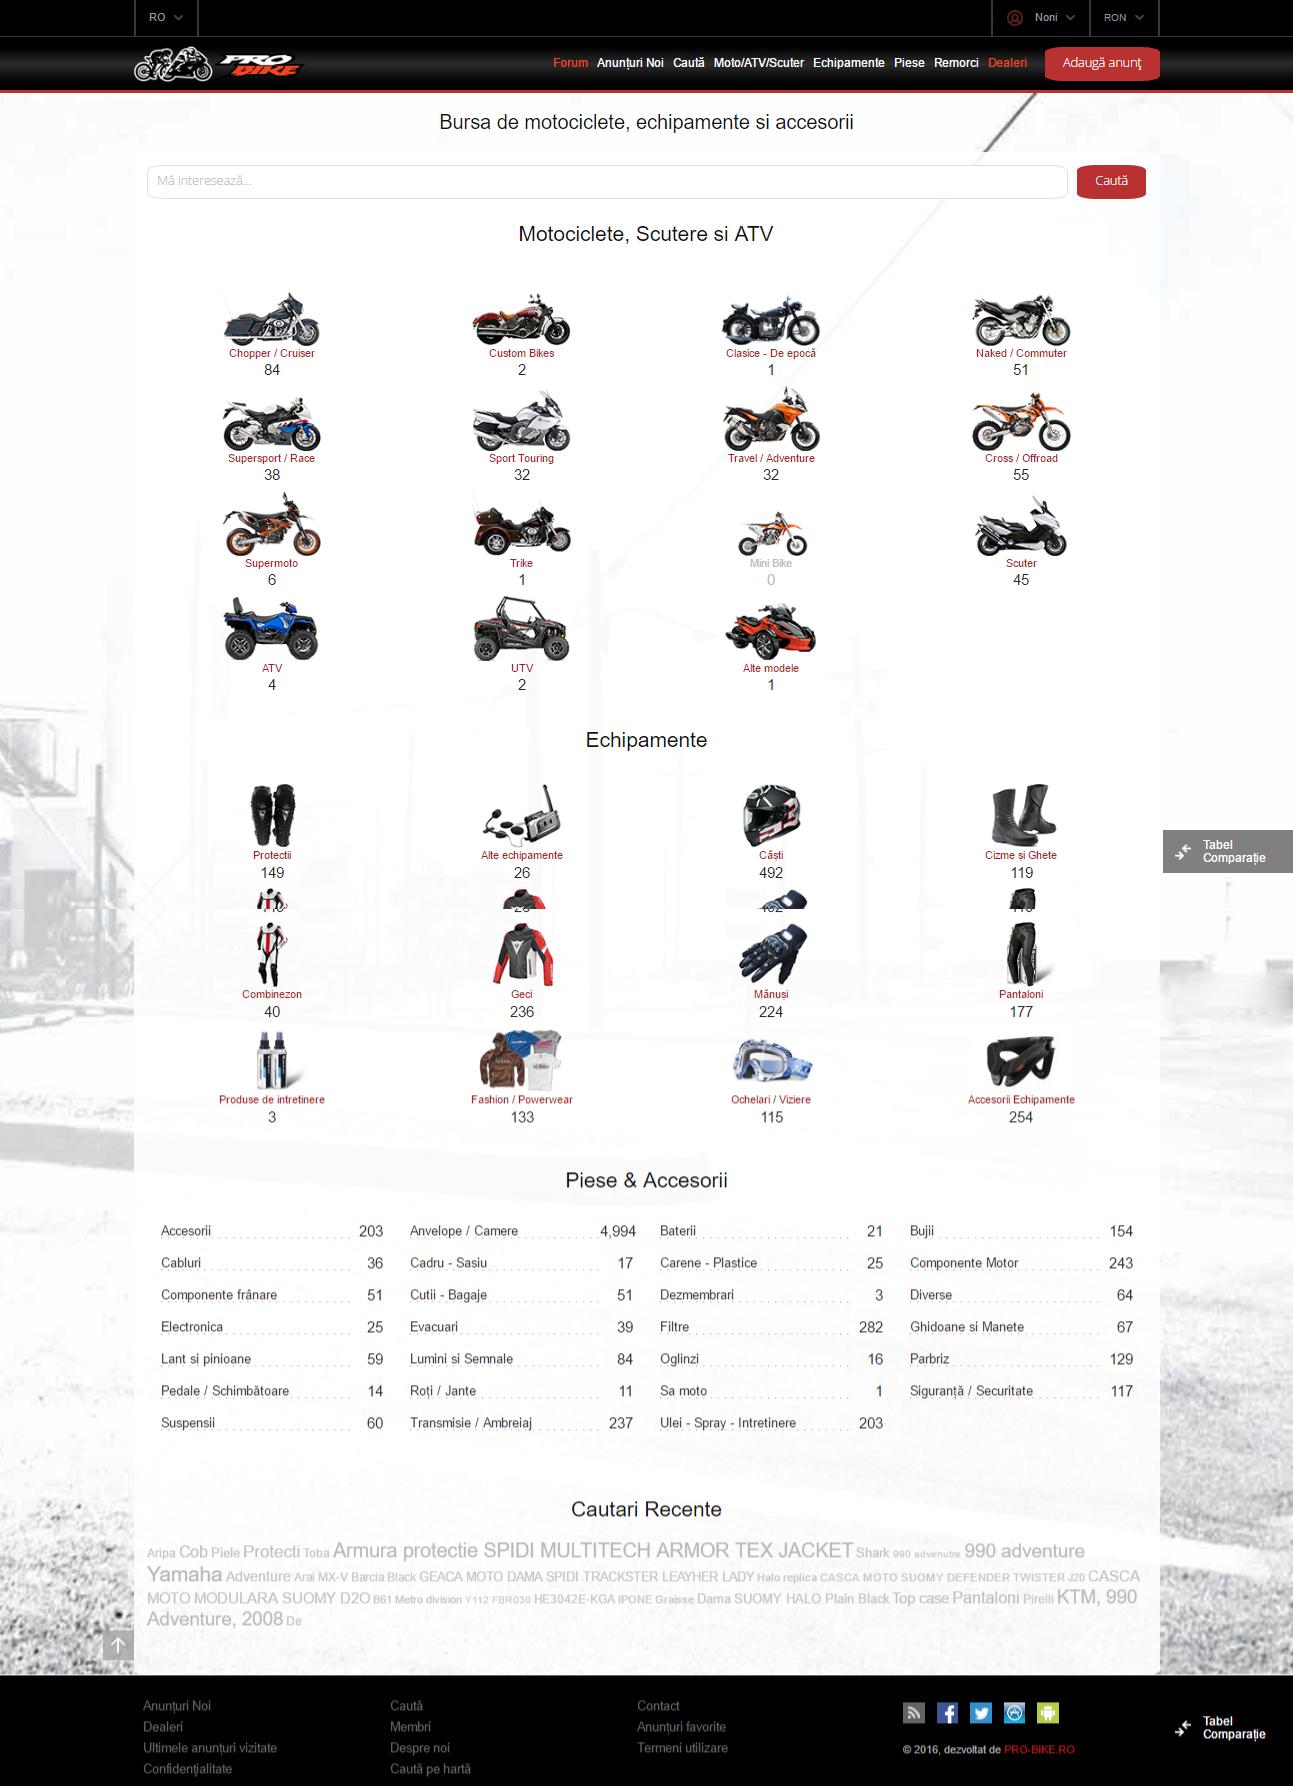 PRO-BIKE Market - BUrsa de motociclete, echipamente si accesorii